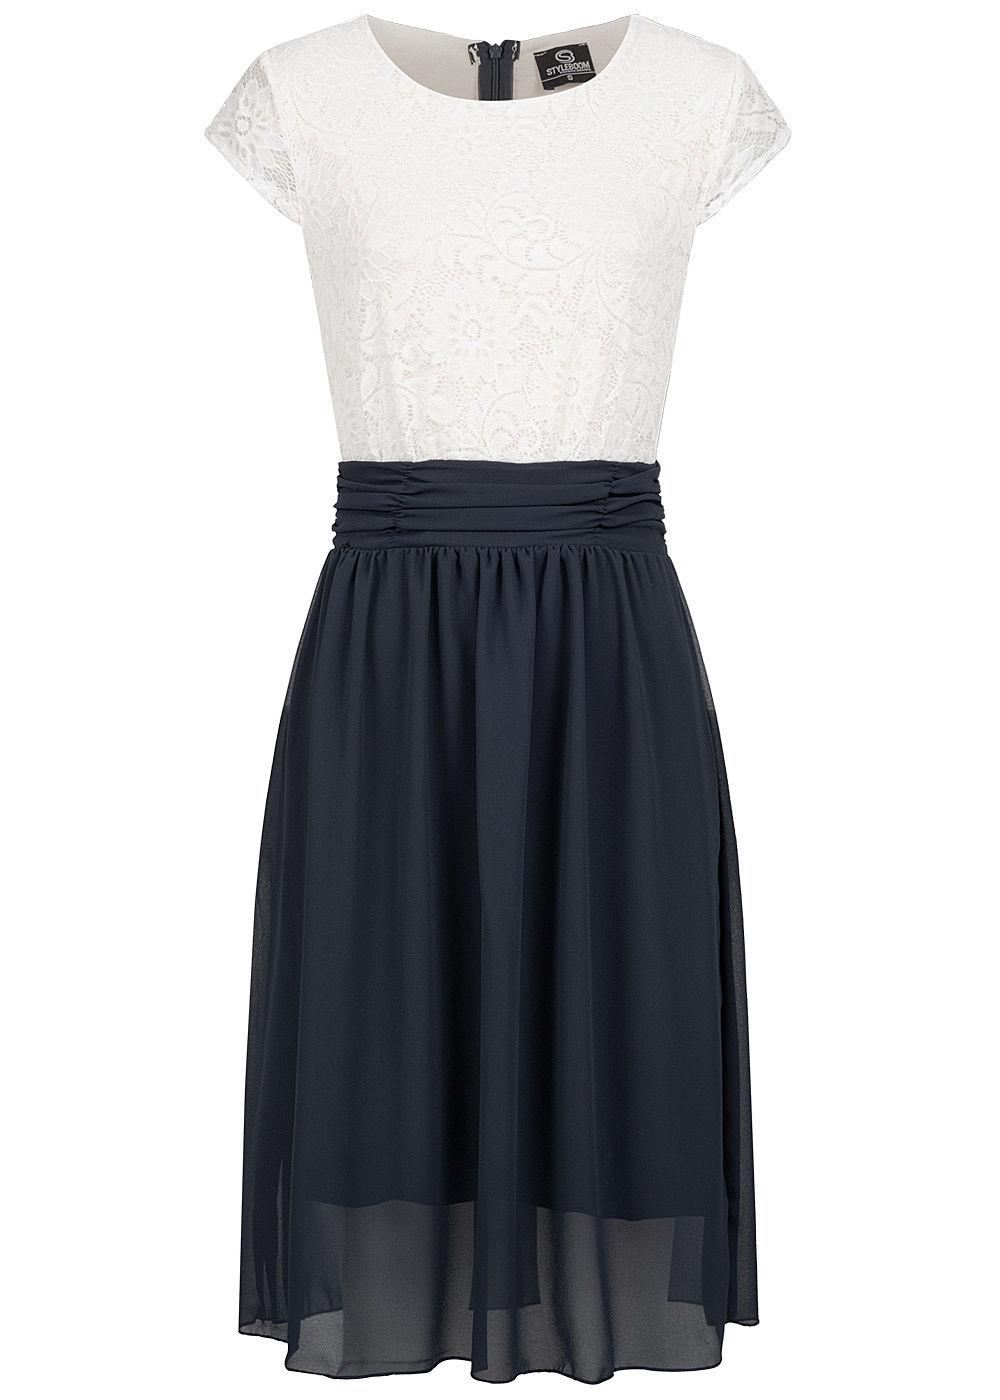 Styleboom Fashion Damen 17-Tone Chiffon Kleid mit inkl. Gürtel 17